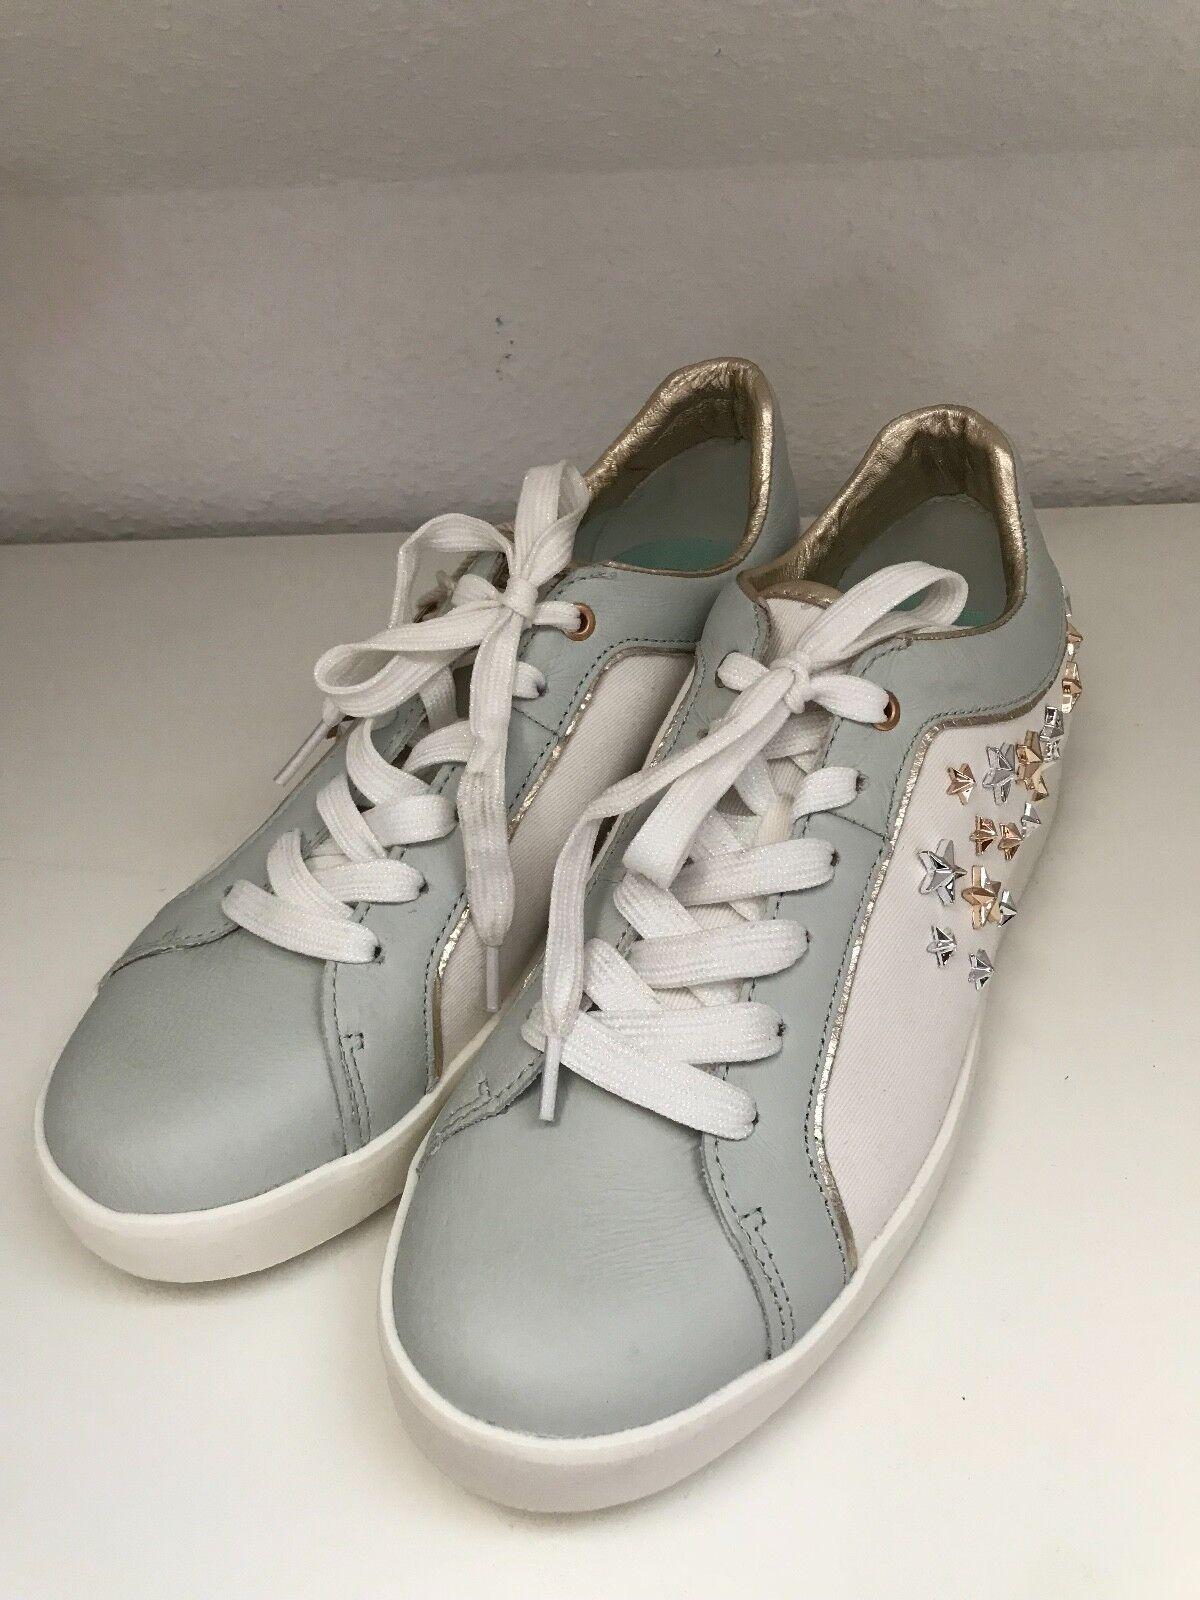 ★☆☆ Sterne REPLAY ☆☆★ coole Damen Echtleder Sneaker Sterne ★☆☆ Nieten Grau/Weiß Gr.41 NEU f1bb71